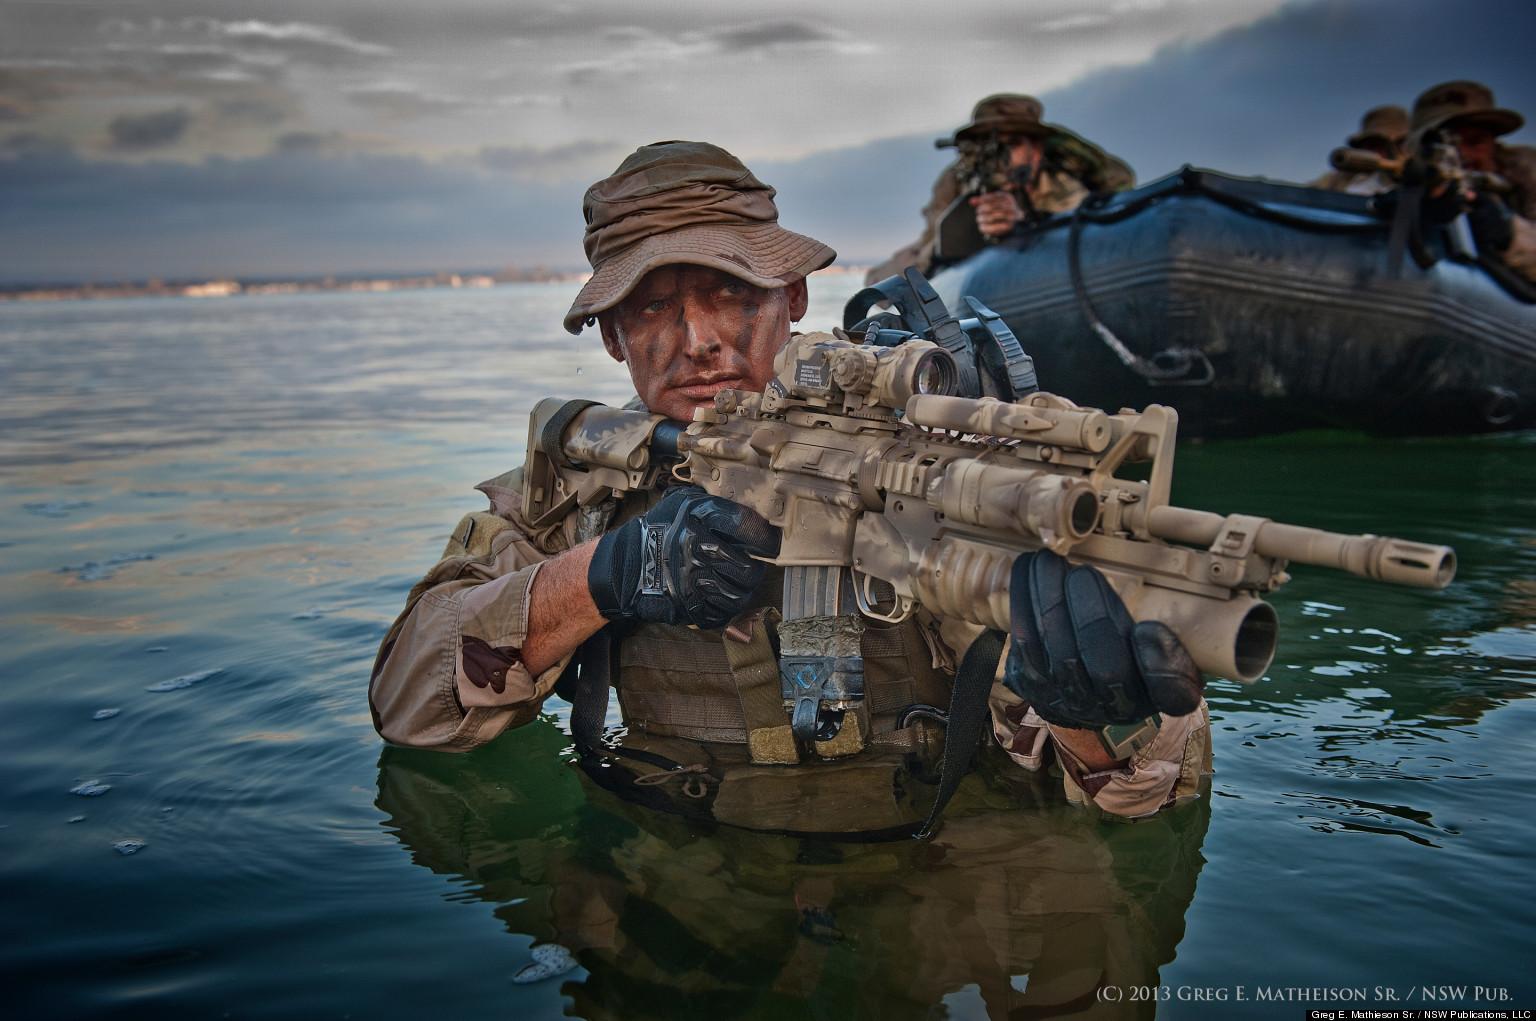 http://i.huffpost.com/gen/1114861/thumbs/o-NAVY-SEALS-facebook.jpg